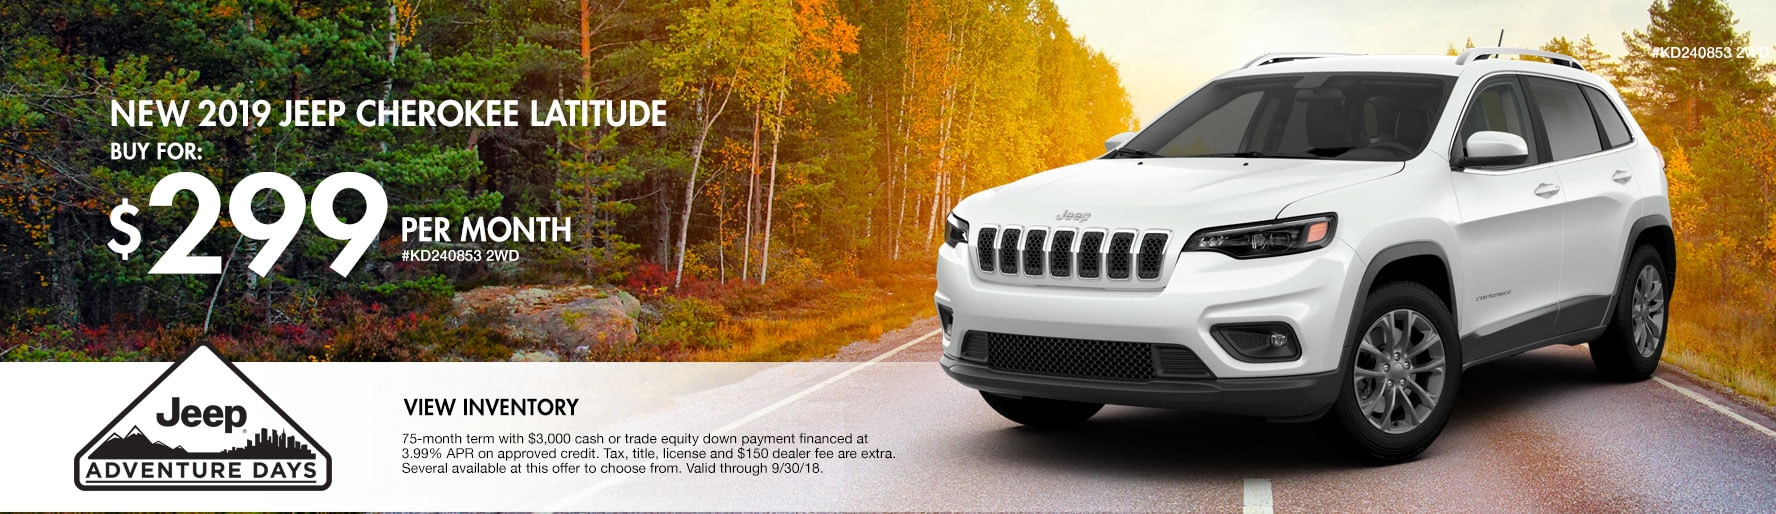 Richardson Chrysler Jeep Dodge Ram Dealership New Used Vehicles 99 Wrangler Fuel Filter Location Previous Next